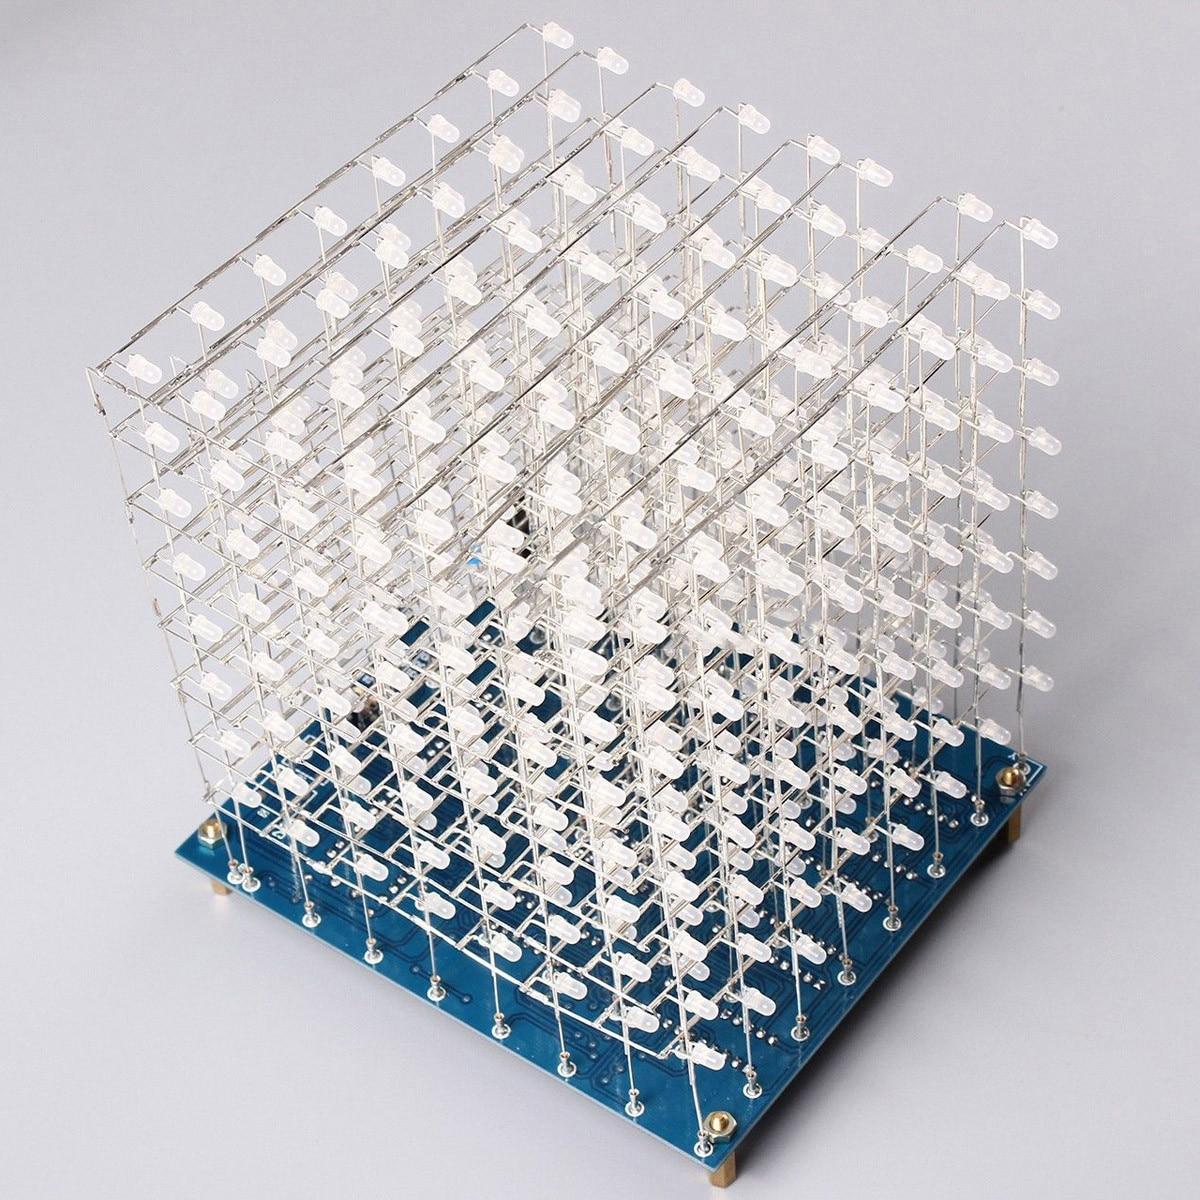 ARILUX 8x8x8 512 LED azul LED Light Cube Kit 3D LED DIY Kit electrónico Suite para arduino electrónica inteligente cubo Led Kit DIY